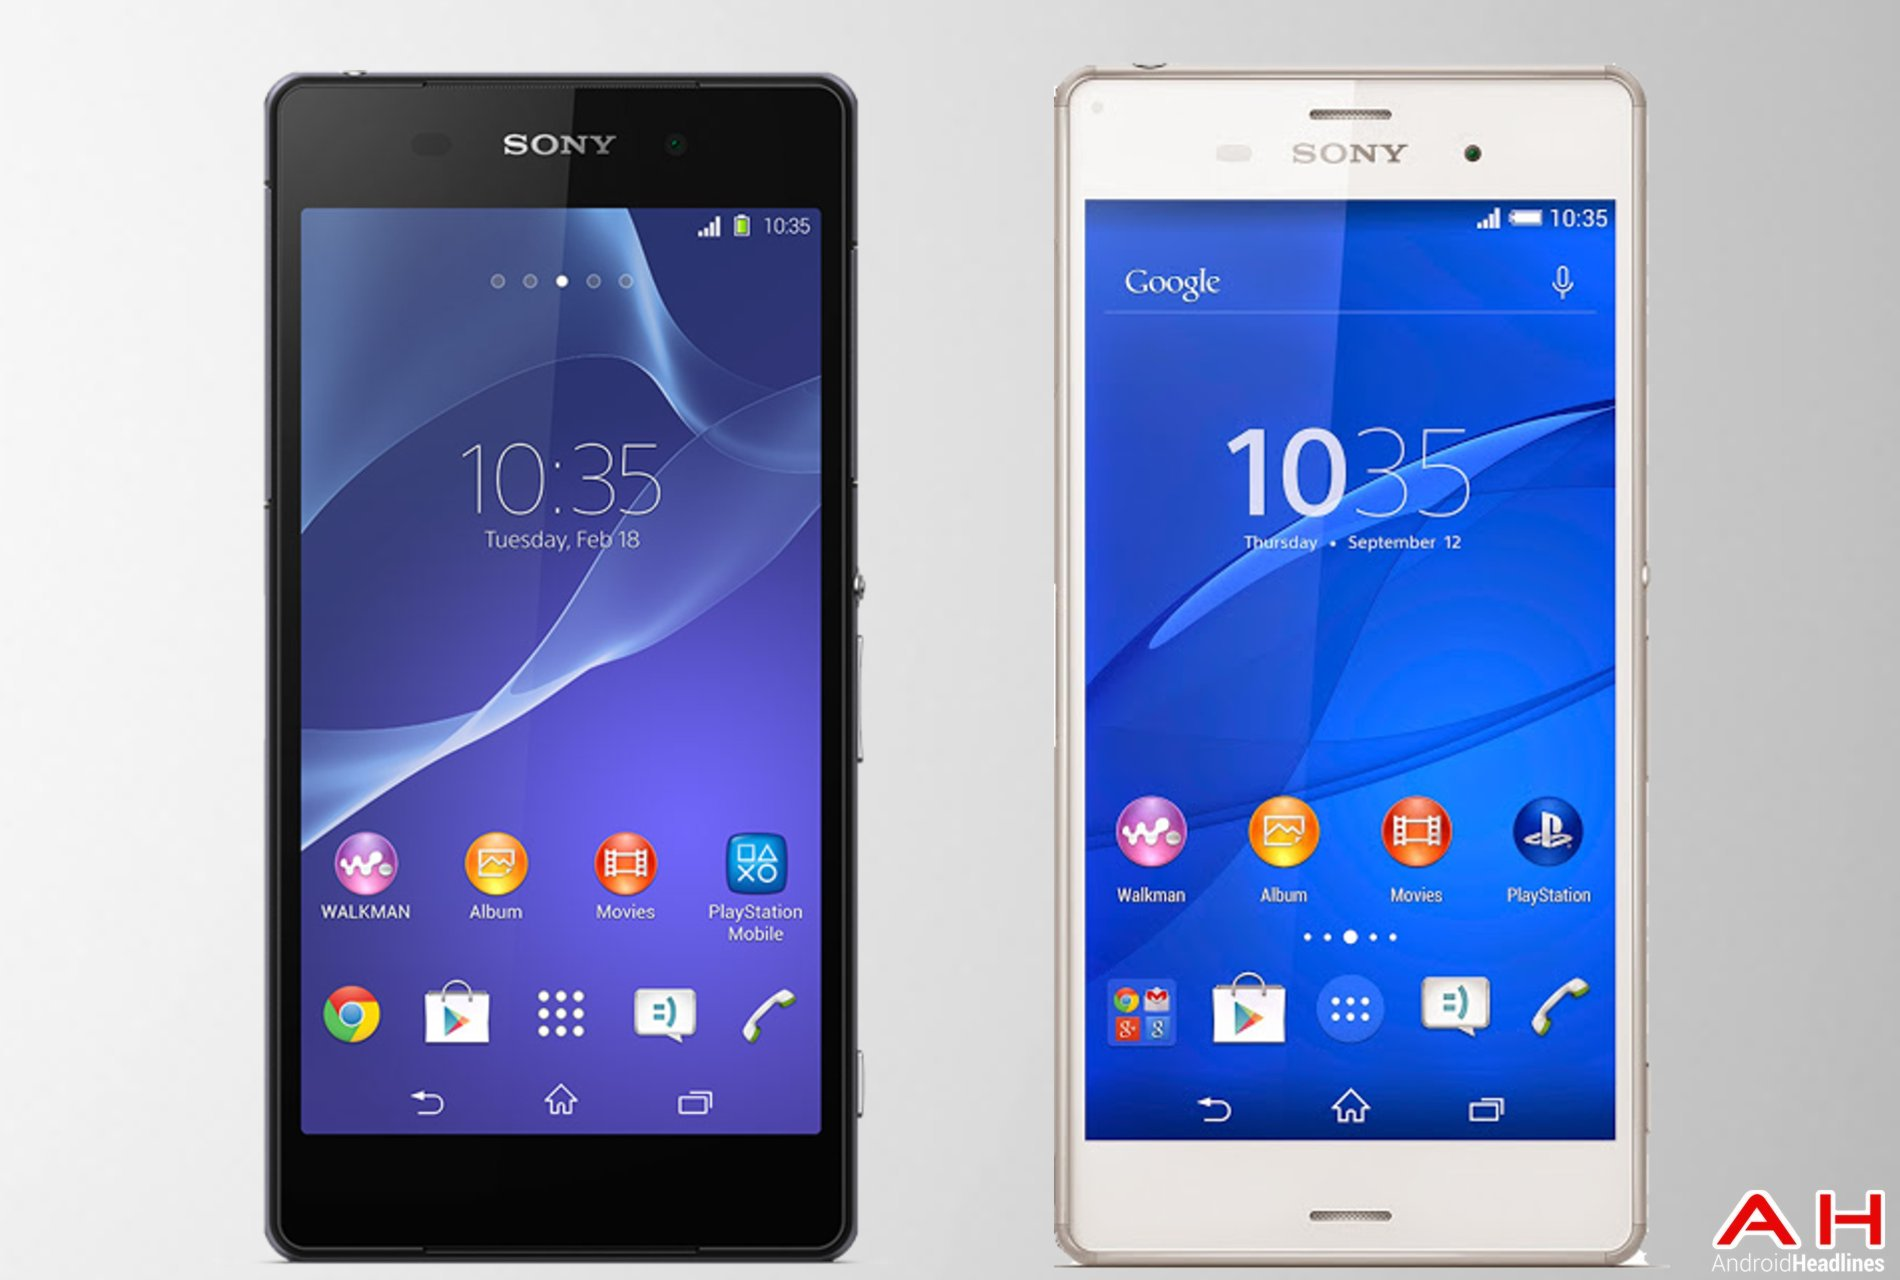 Sony Xperia Z2, Sony Xperia Z3, HTC One (M8), Samsung Galaxy S5 и LG G3 в борьбе за звание чемпиона - Изображение 6